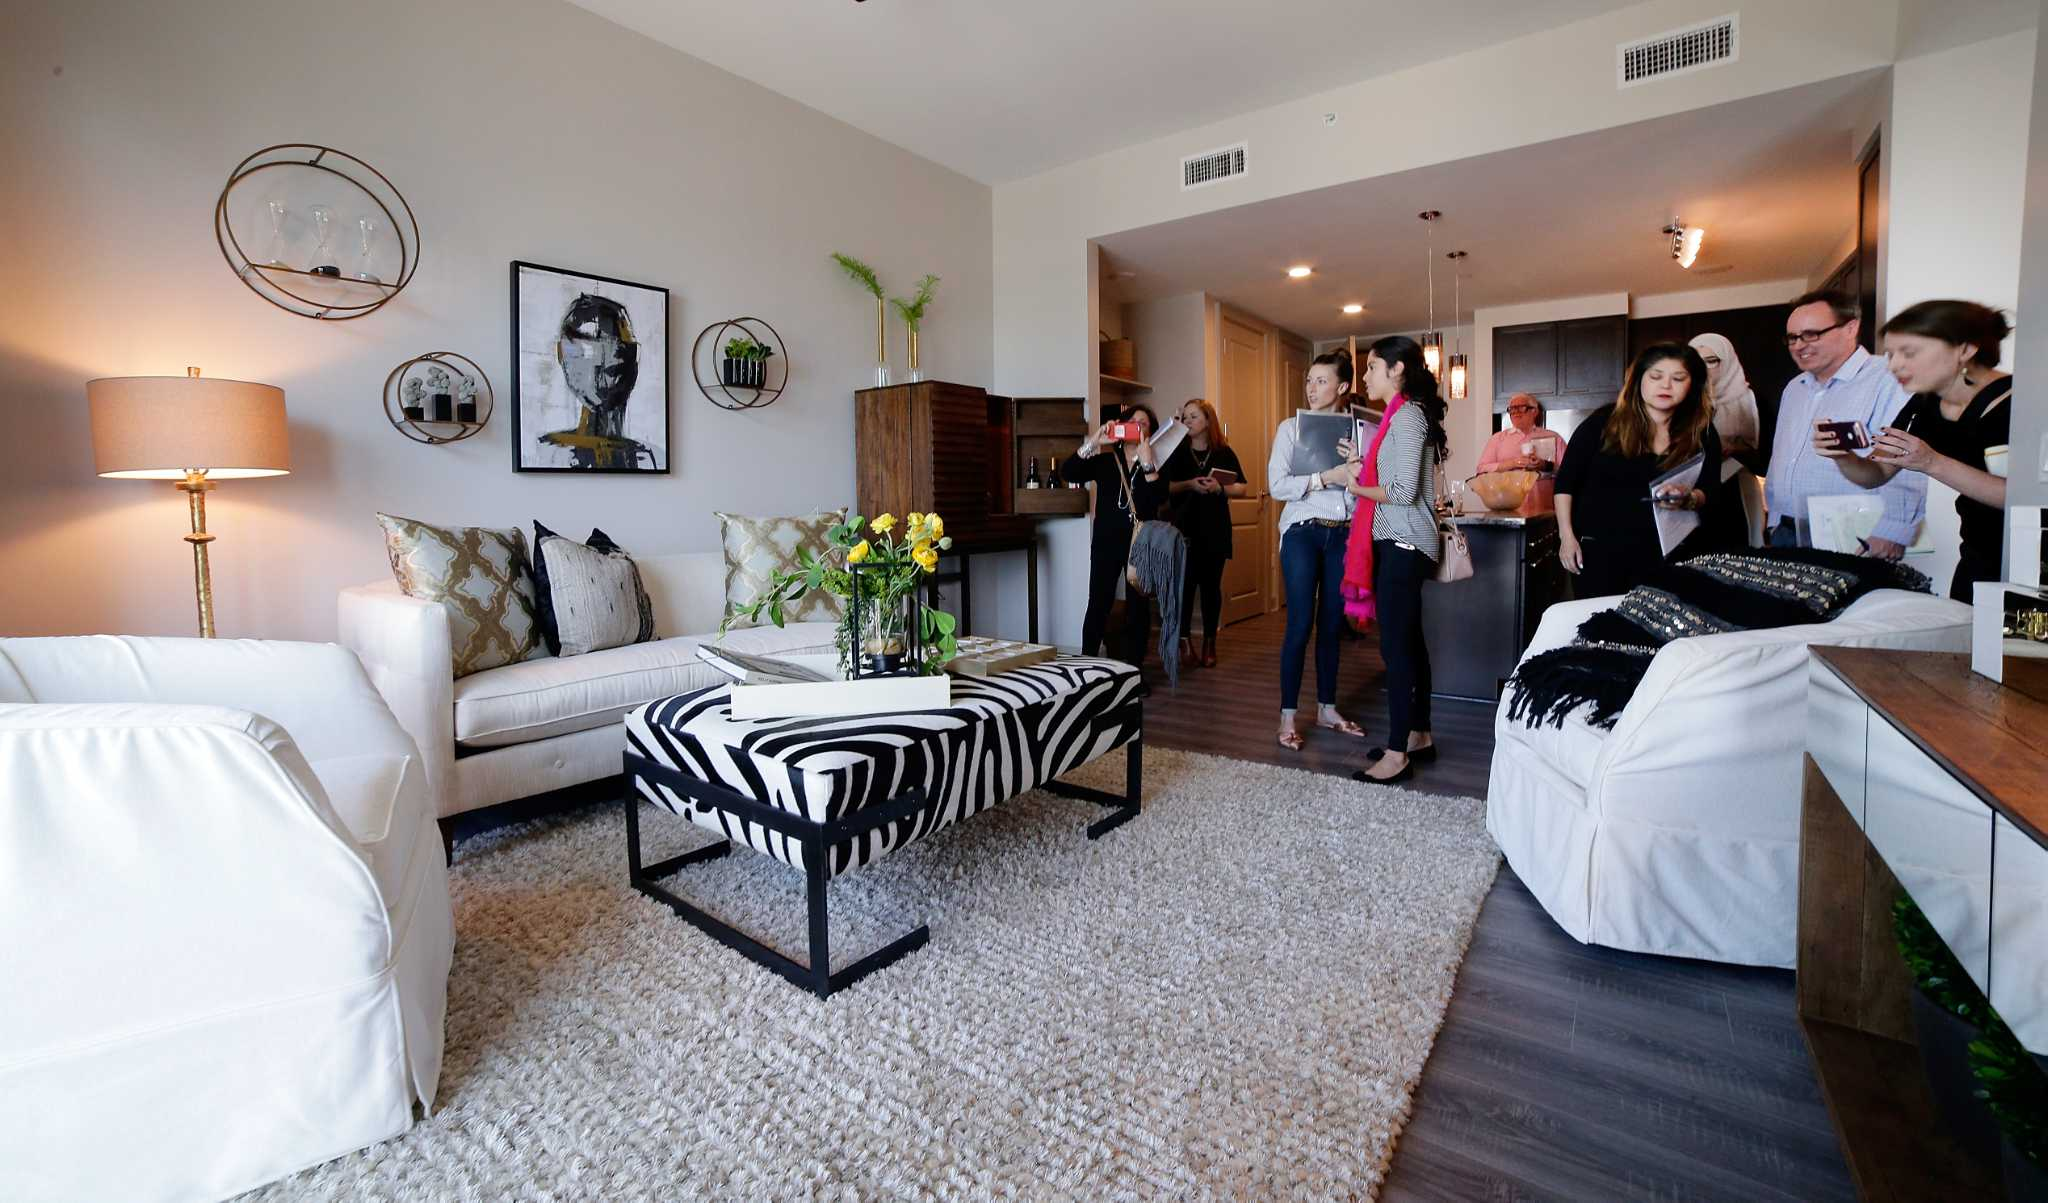 Photos Offer 1st Look Inside Houston's 2nd Hotel ZaZa